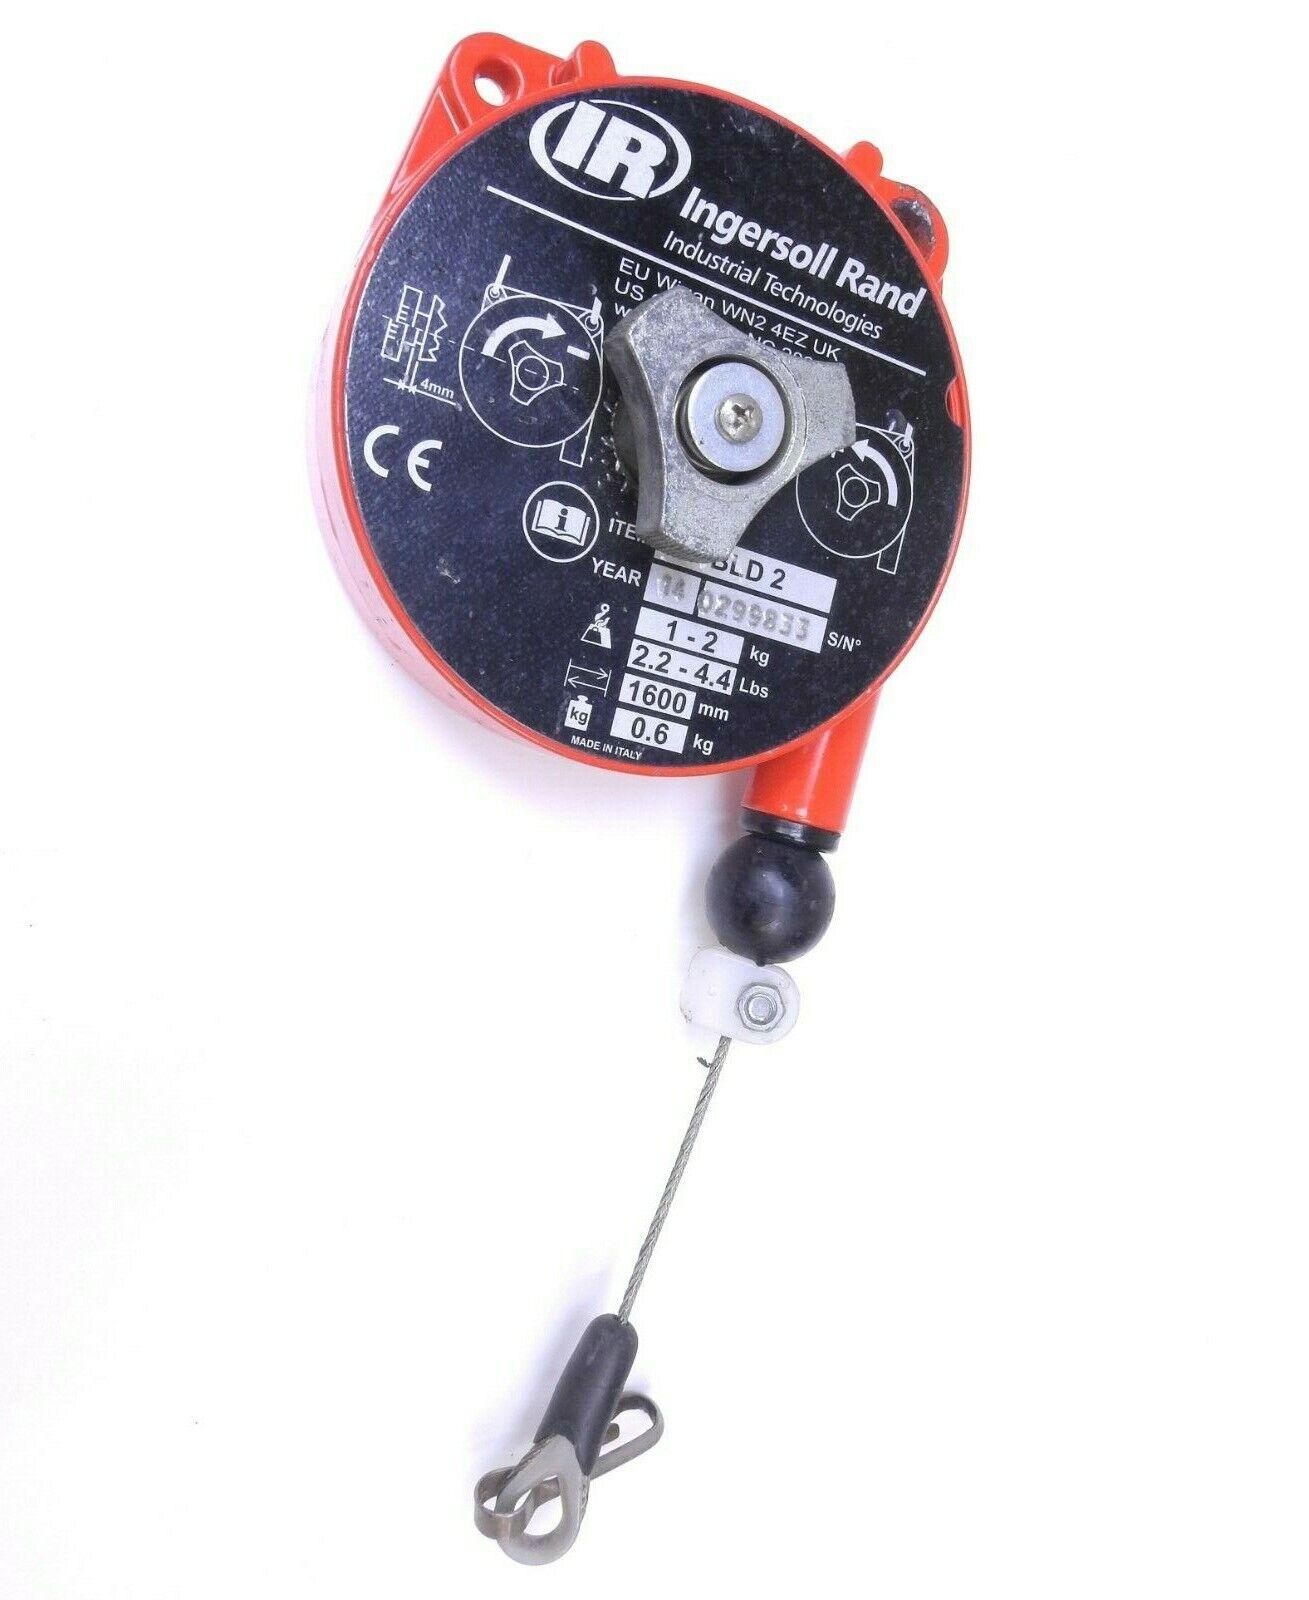 Ingersoll Rand UK BLD2 Tool Balancer